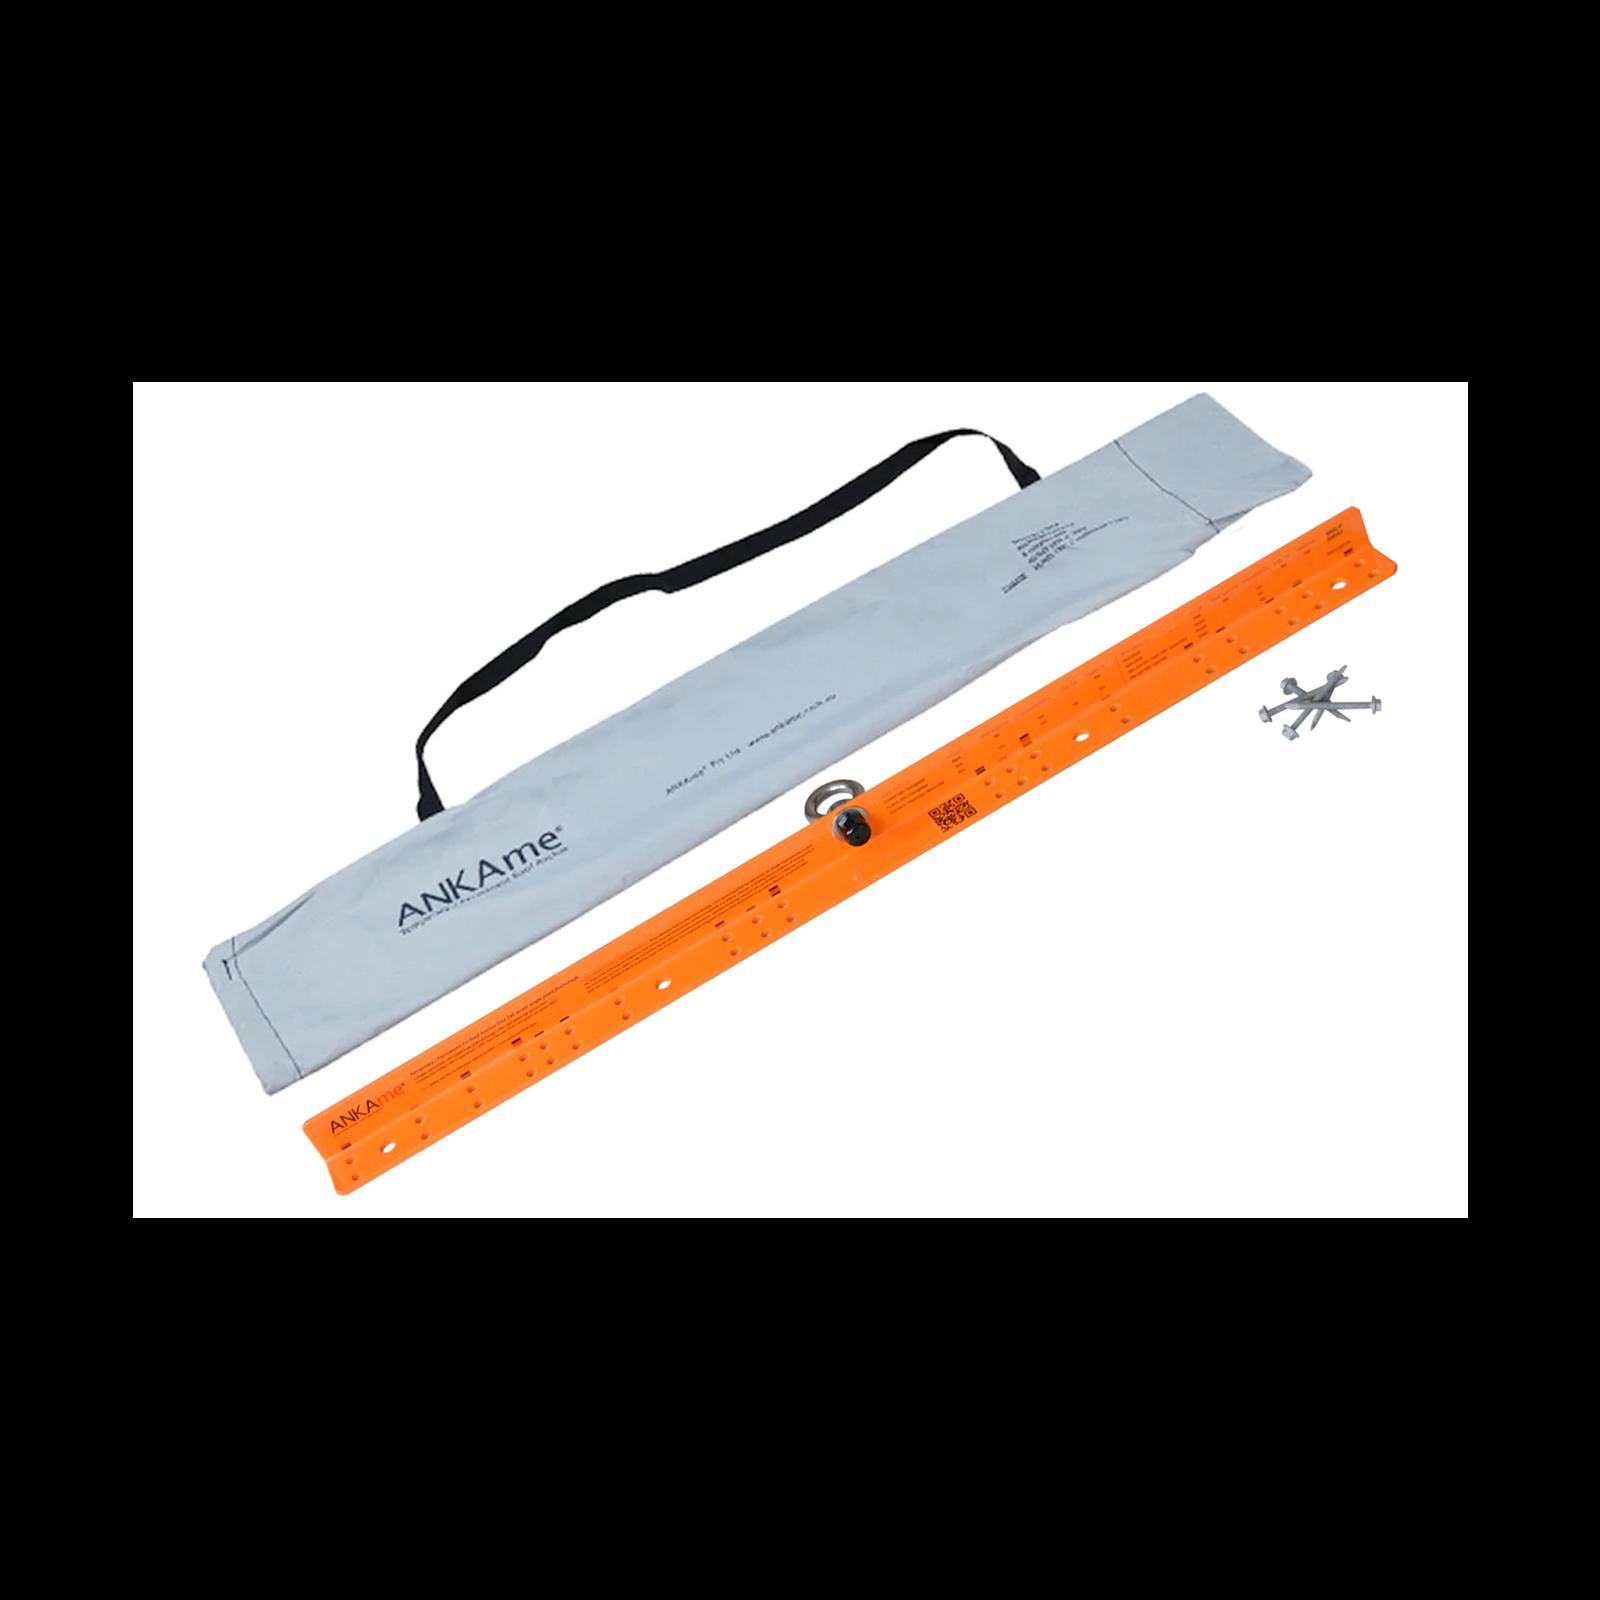 ANKAme 955 x 45 x 45mm Orange Temporary Roof Anchor